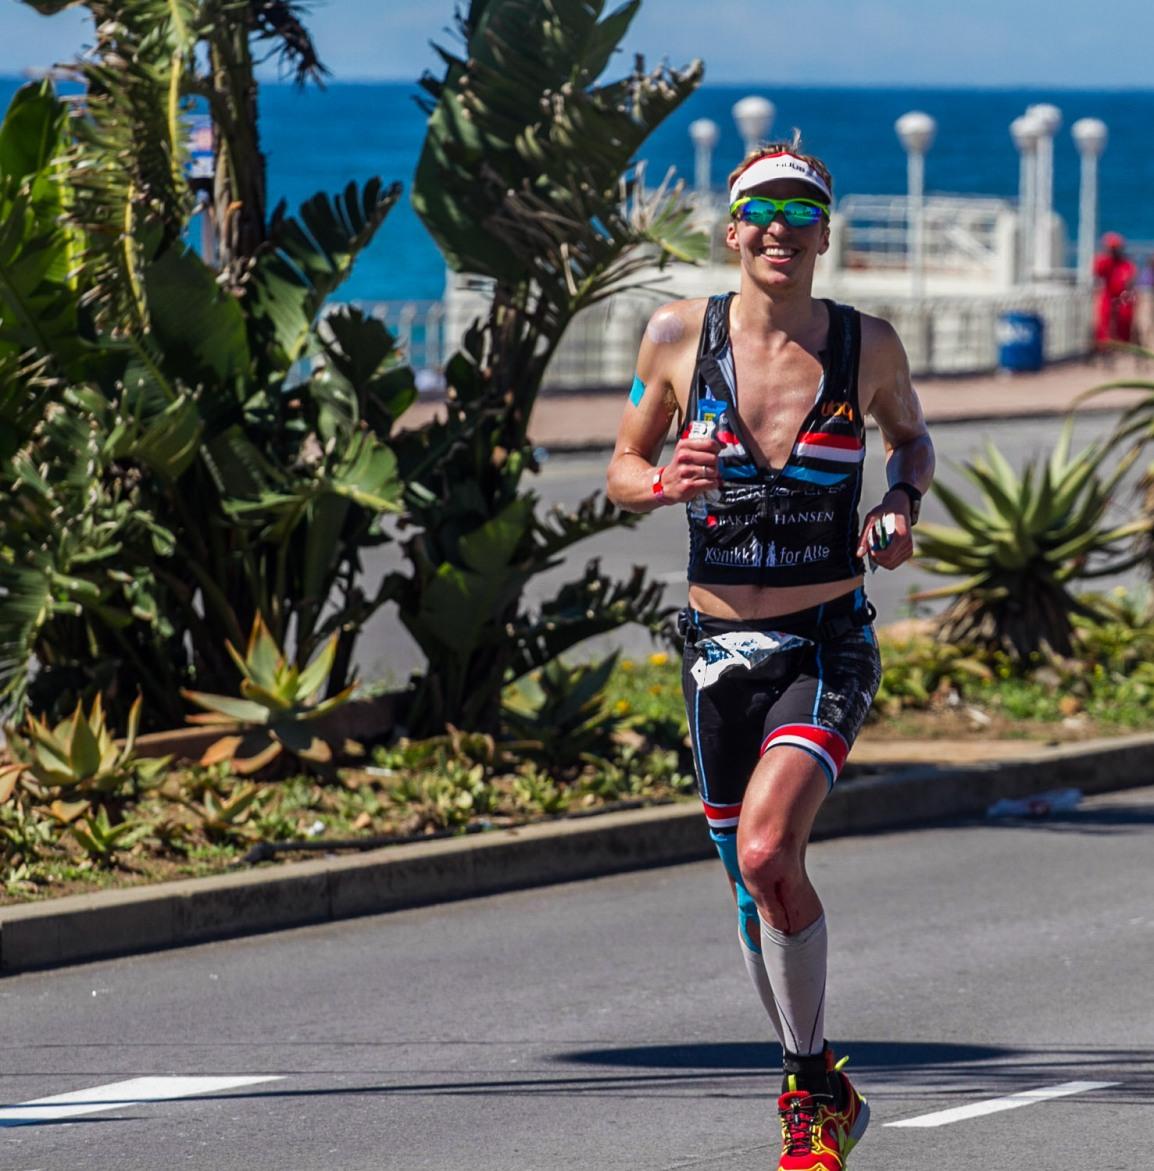 Ironman South Africa - Triallan - Allan Hovda - Humanspeed-3